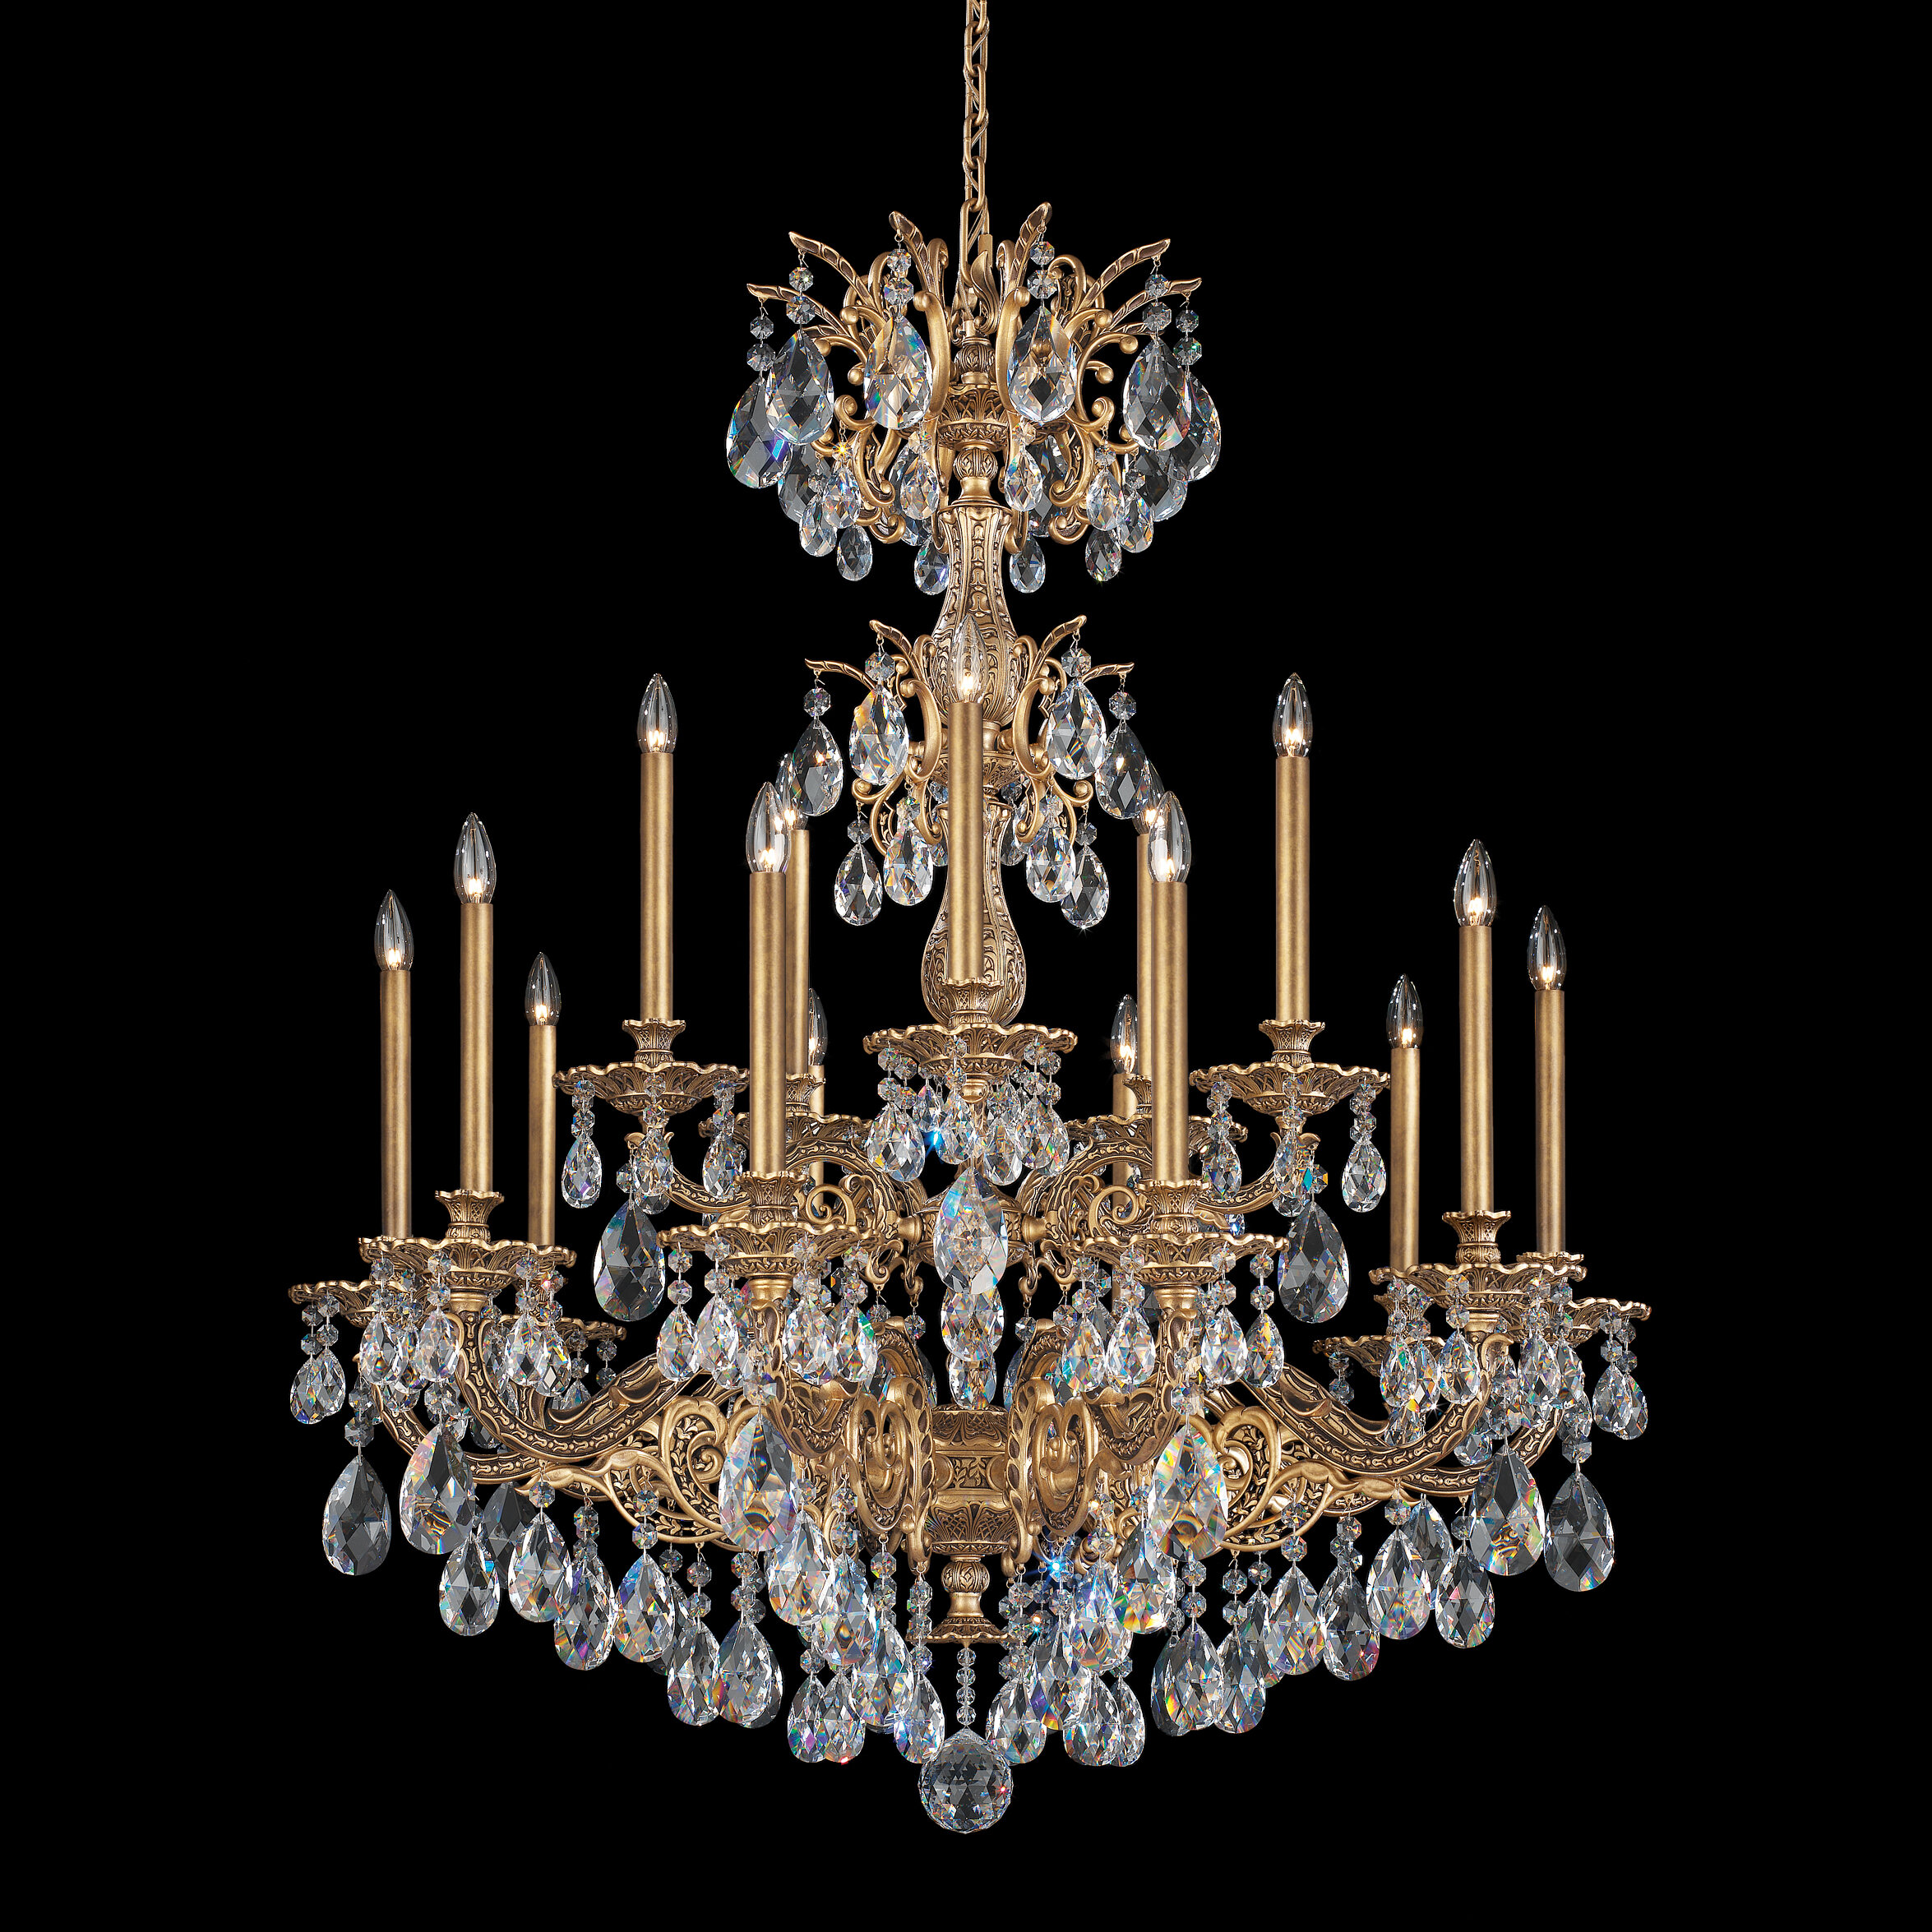 Schonbek Milano 15 Light Candle Style Tiered Chandelier Wayfair